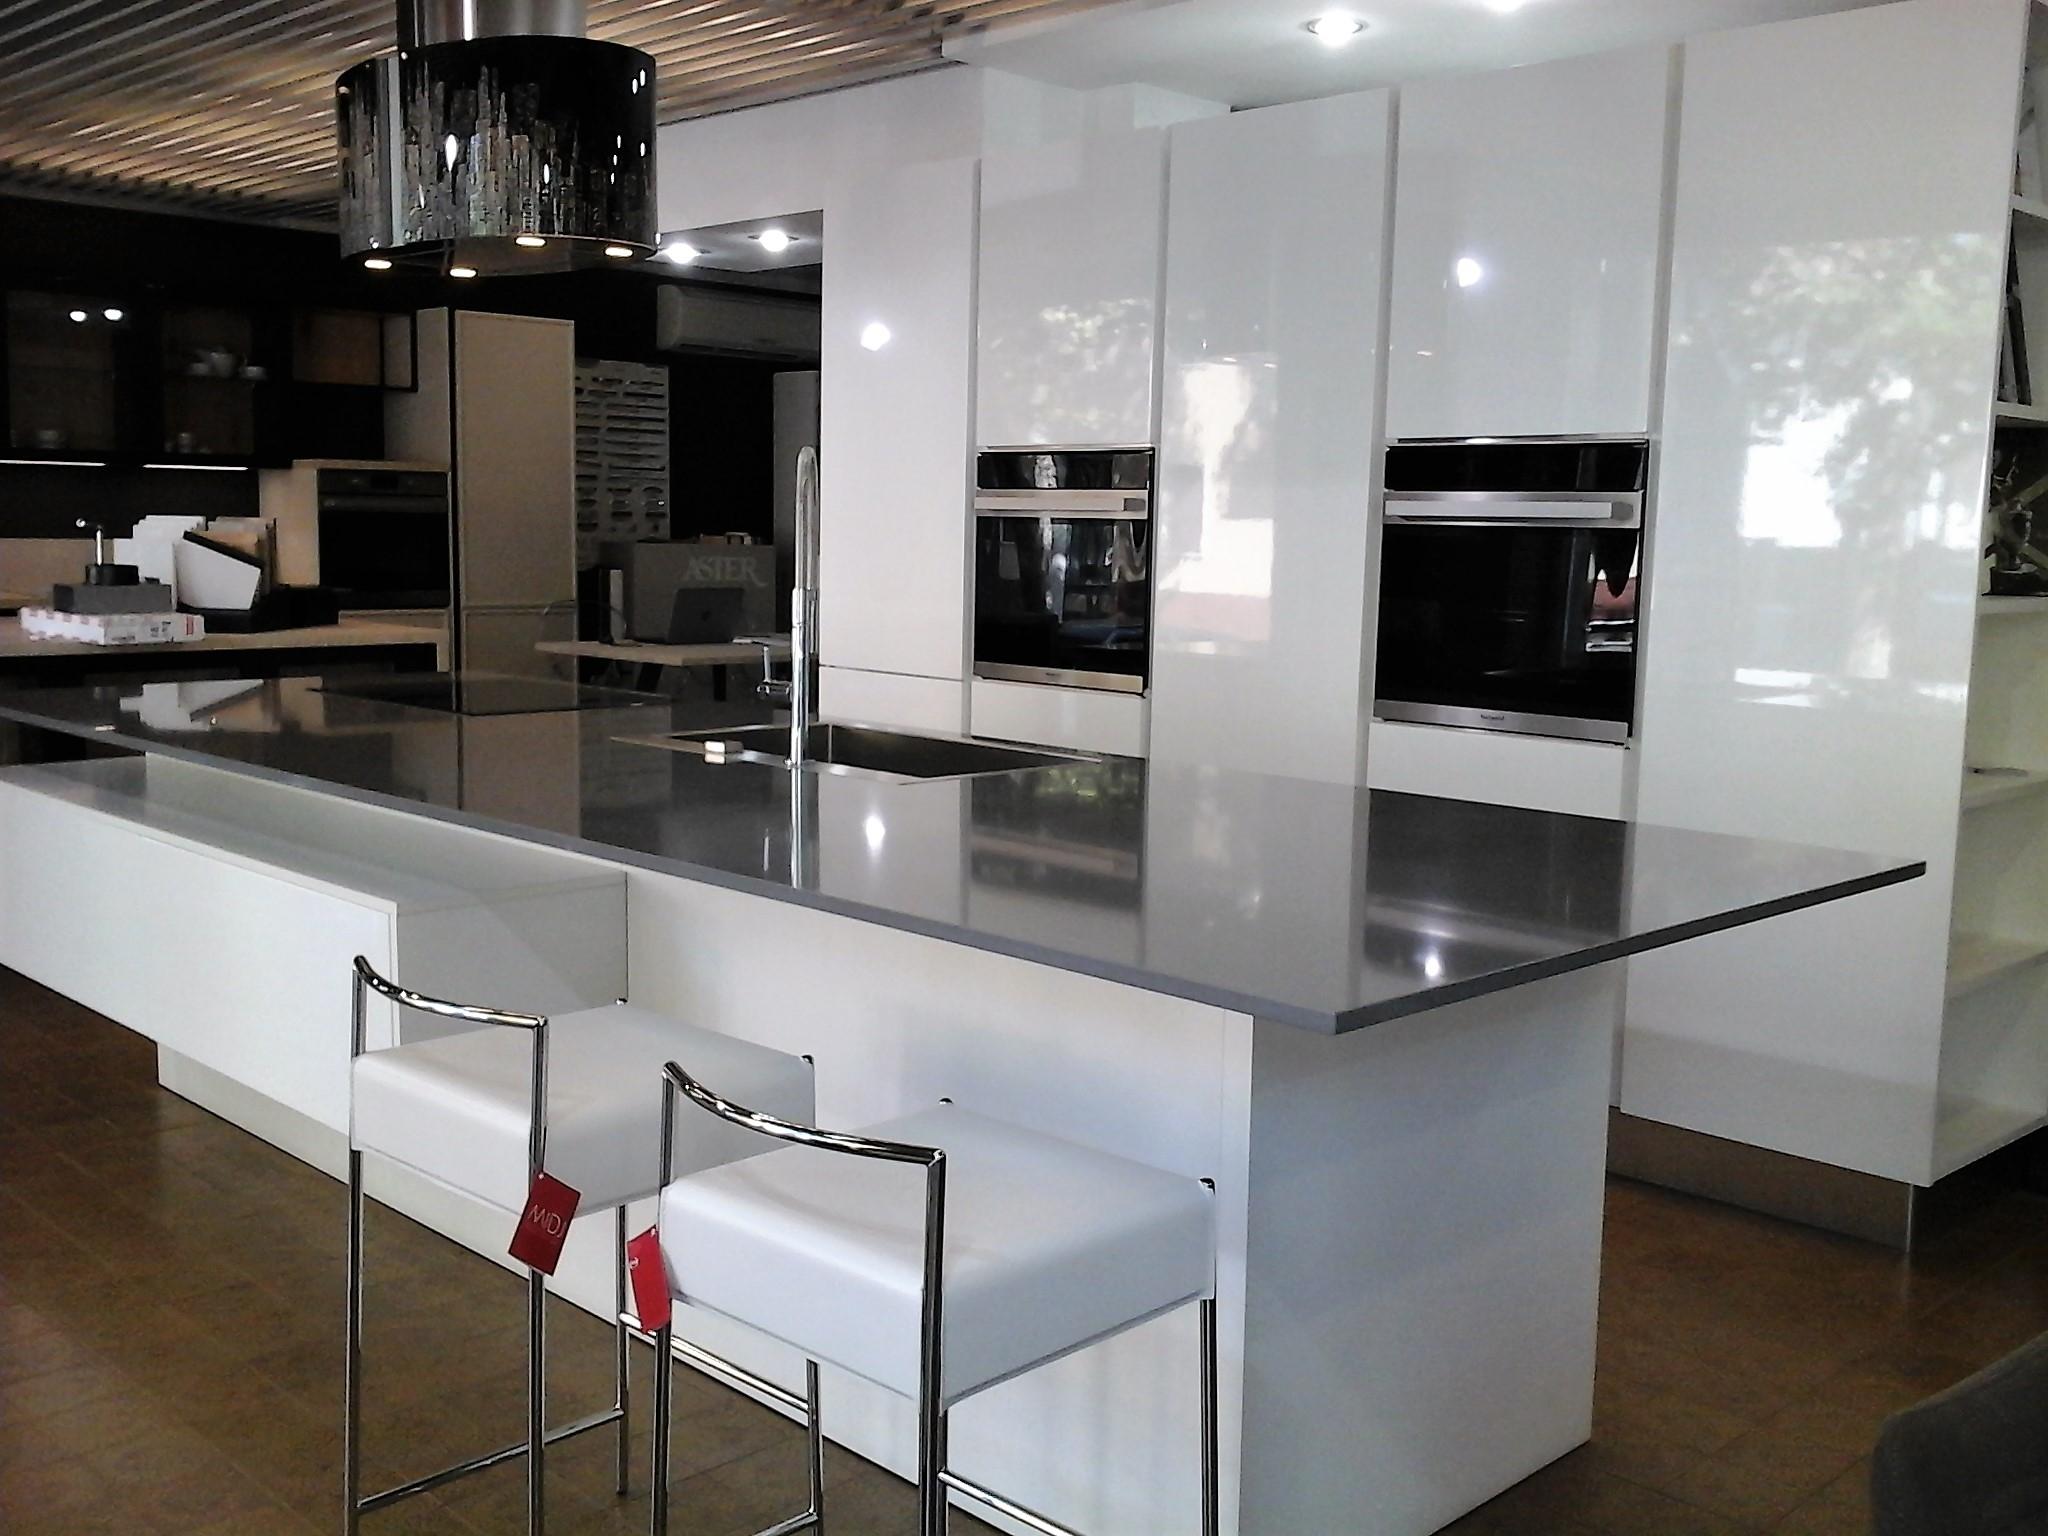 Cucina atra polimerico lucido bianco polimerico lucido for Cucina bianca